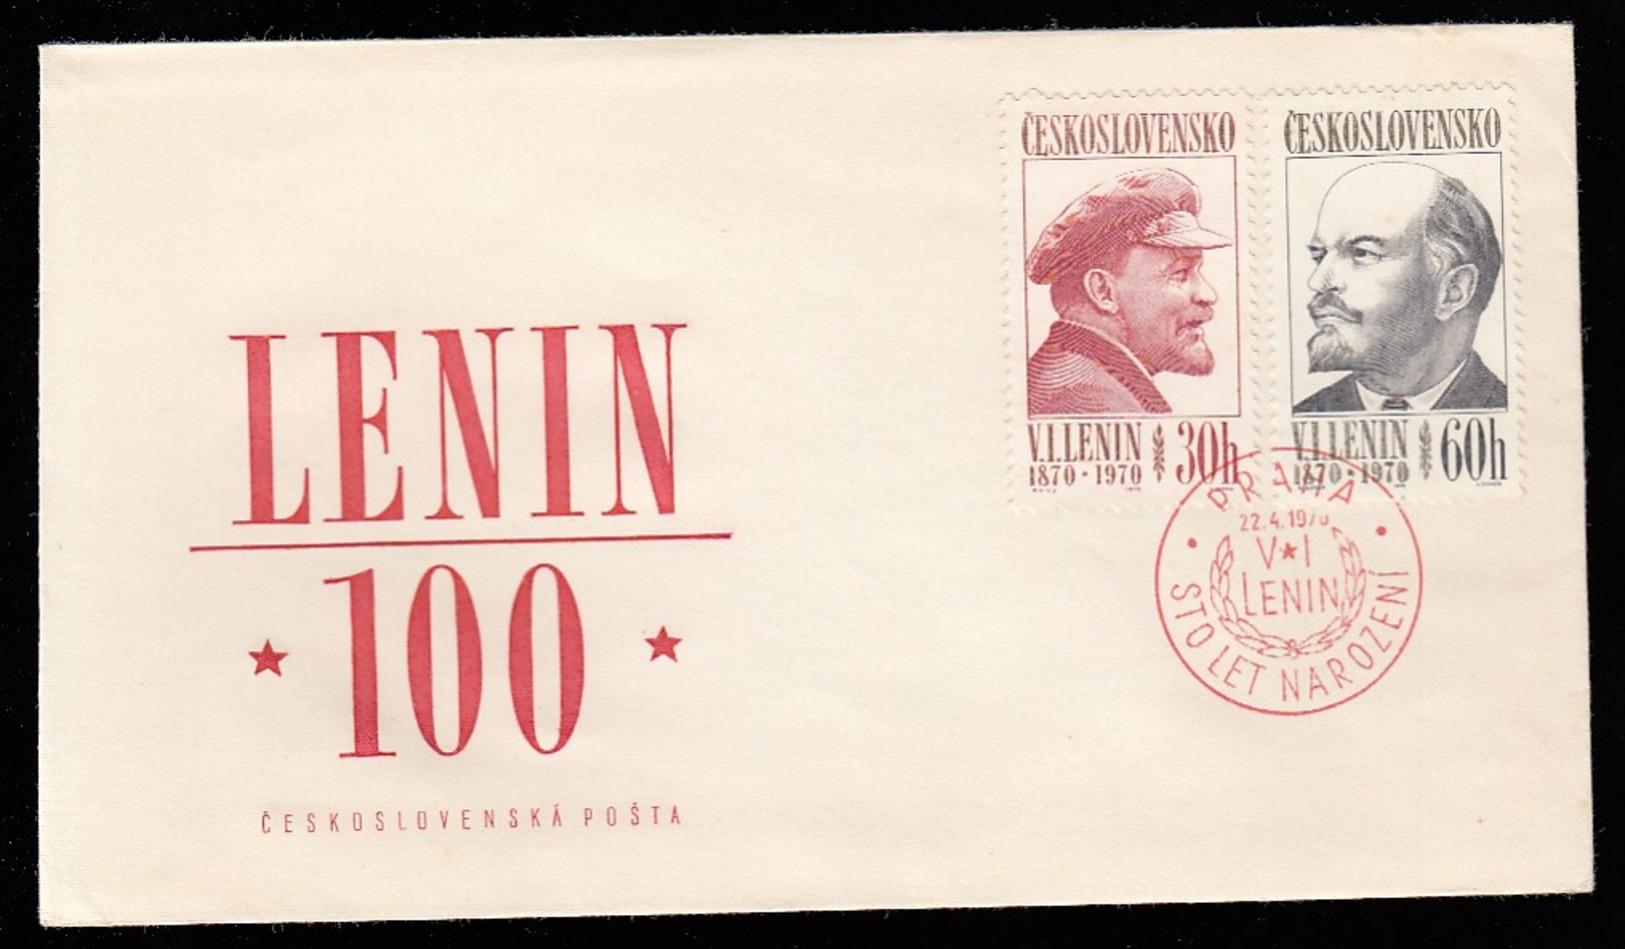 CESKOSLOVENSKO * CZECHOSLOVAKIA * CZECH FDC 100th ANN. BIRTH OF LENIN 1970 - FDC